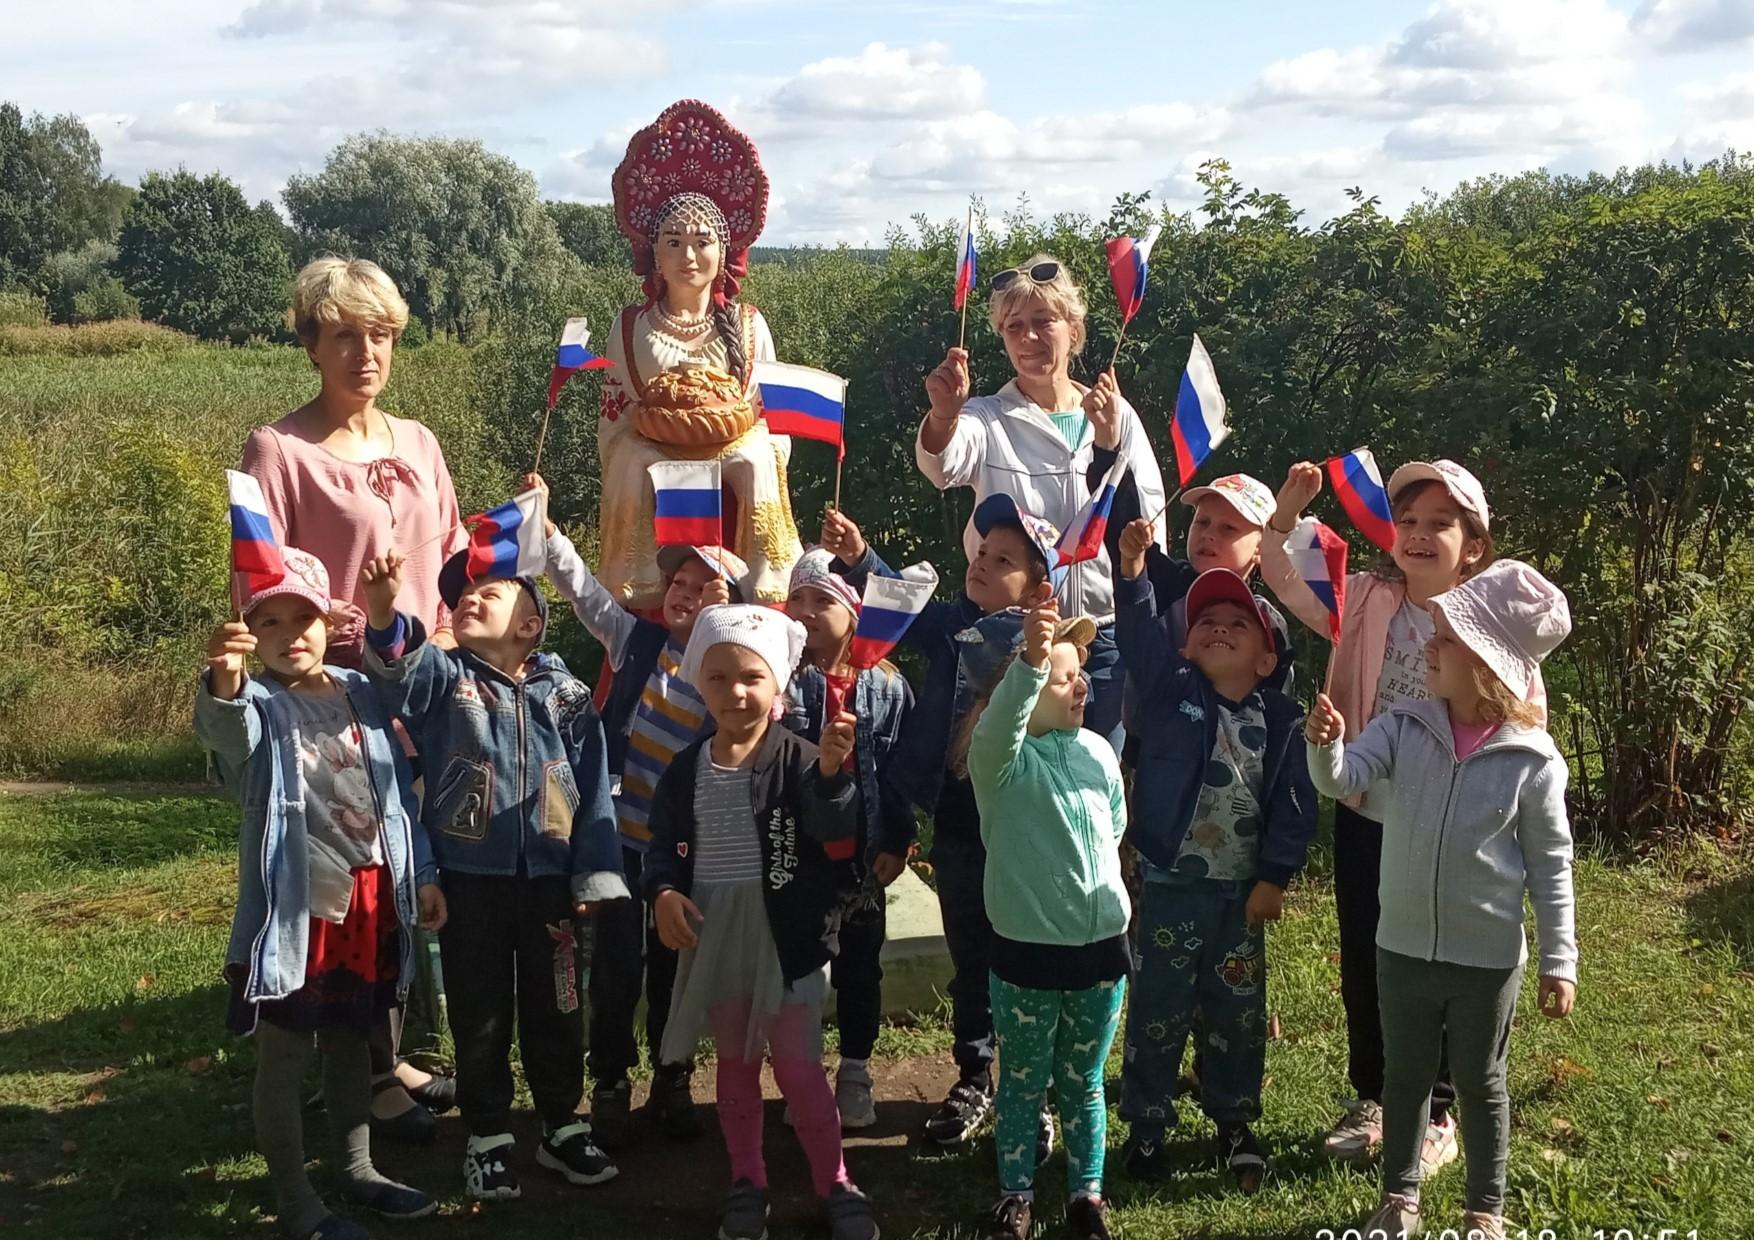 В Торопецком районе к празднику собирали флаги